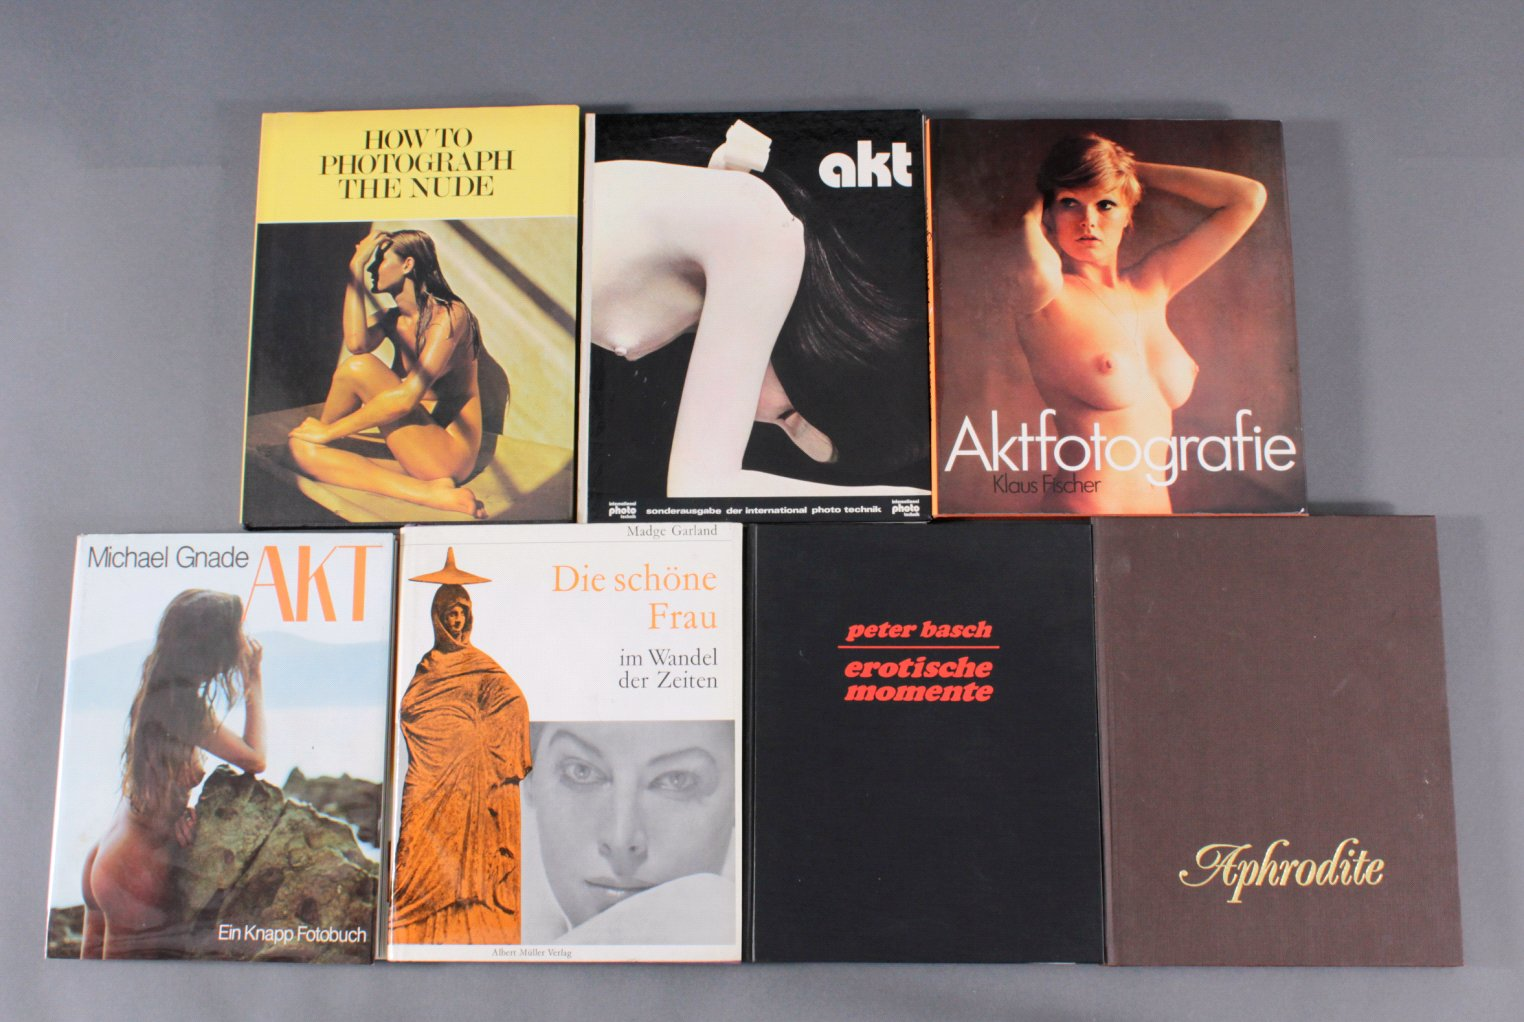 Konvolut Bücher zum Thema Aktfotografie, 7 Stück